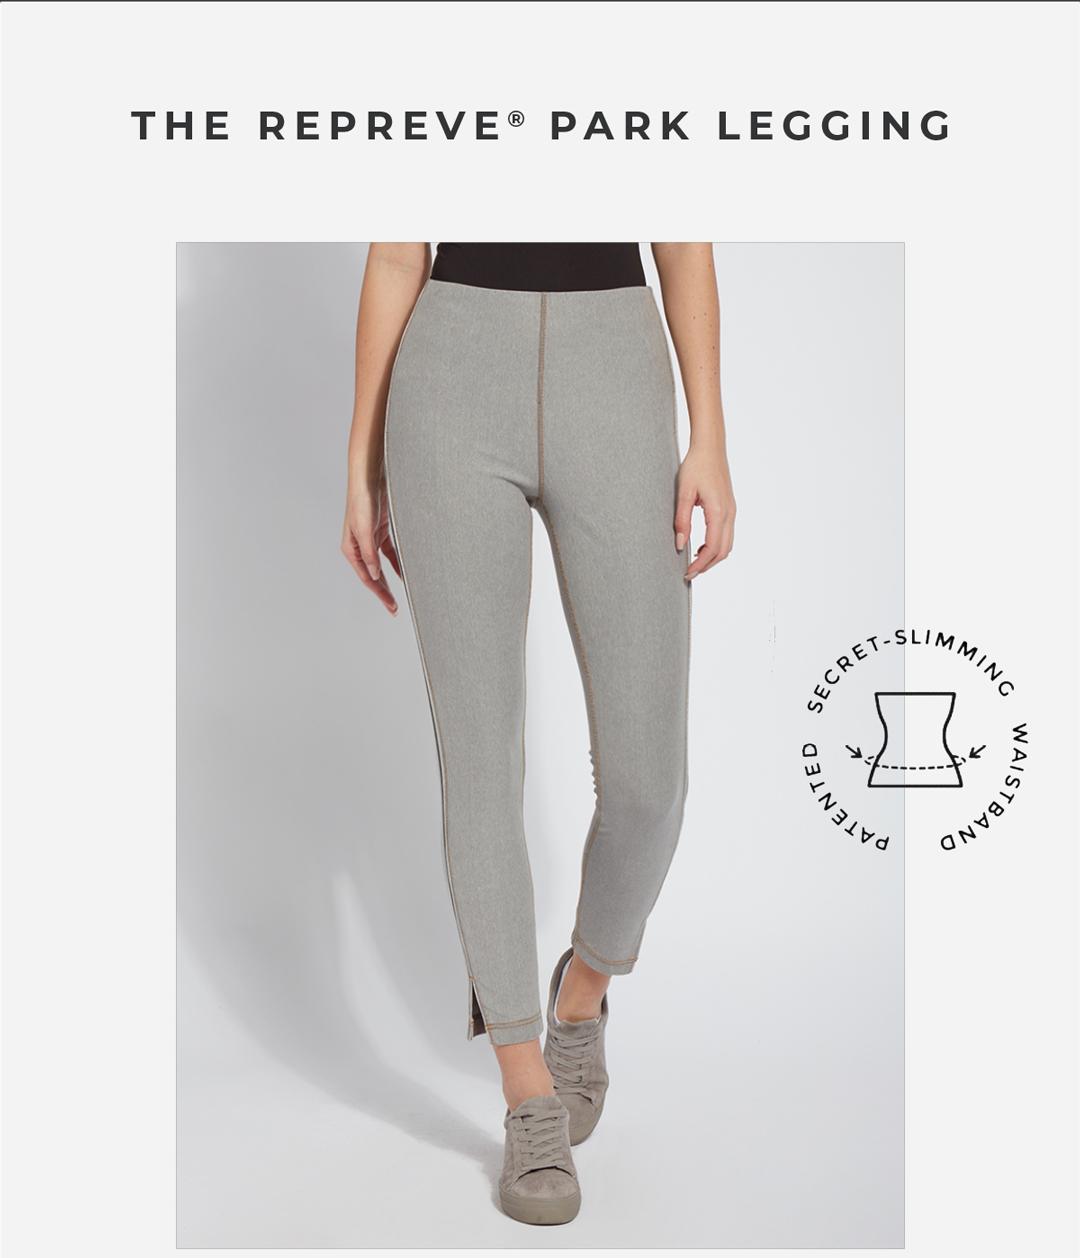 The Repreve Park legging